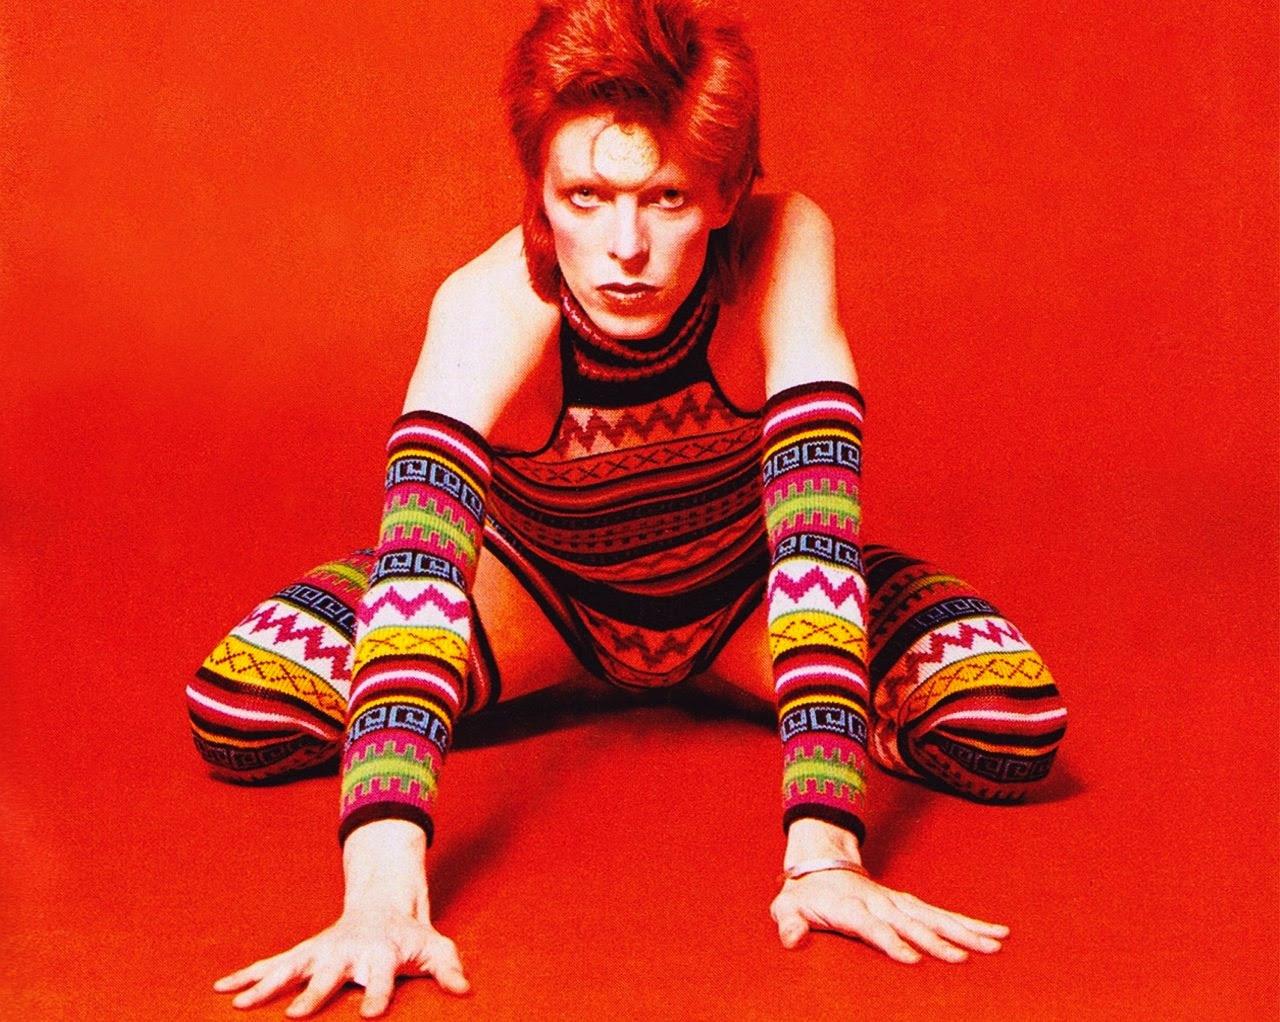 http://tomandlorenzo.com/wp-content/uploads/2016/01/David-Bowie-Tom-Lorenzo-Site-3.jpg